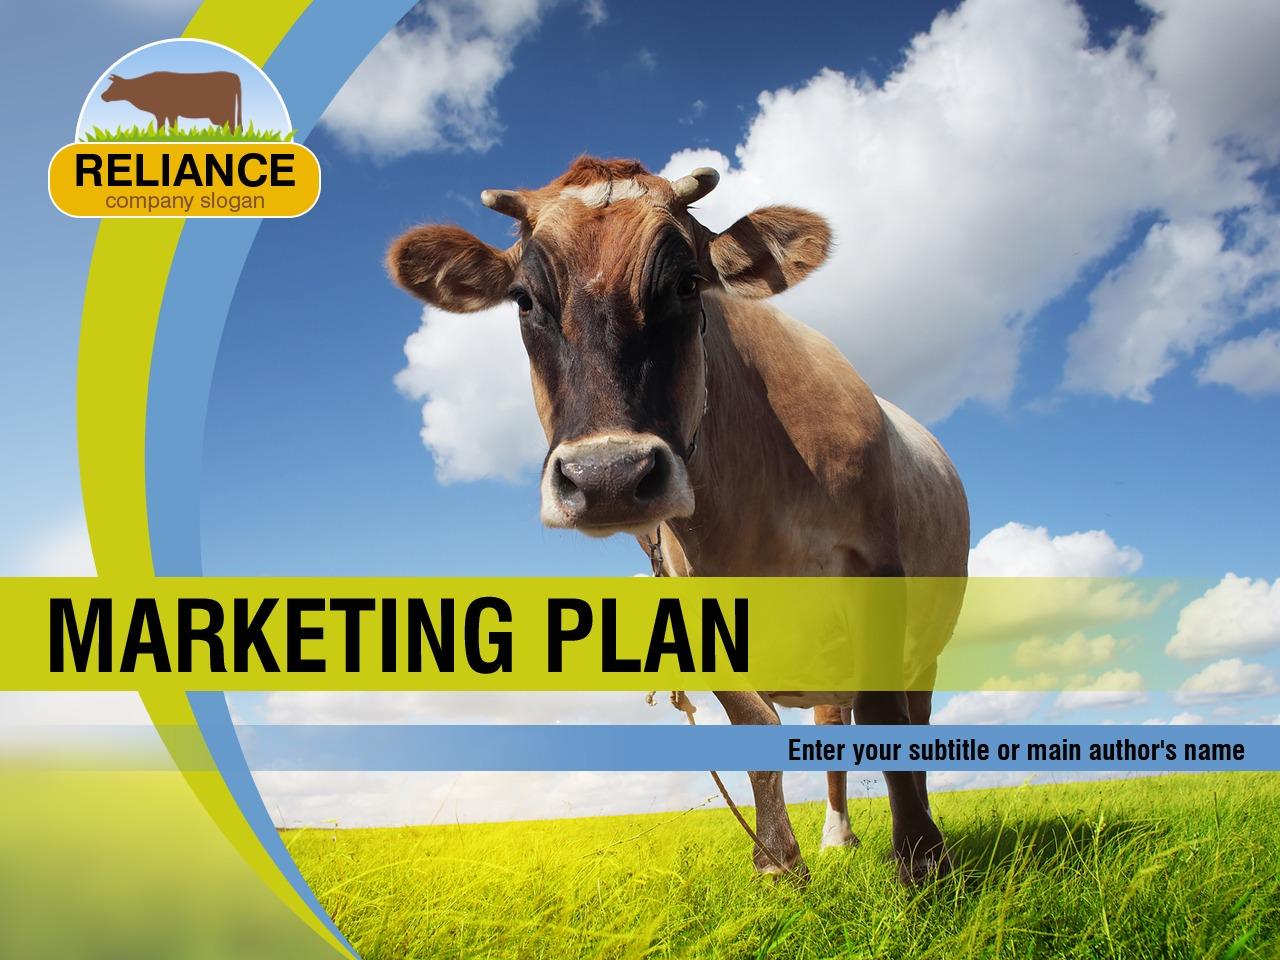 PowerPointmall för bondgård #36683